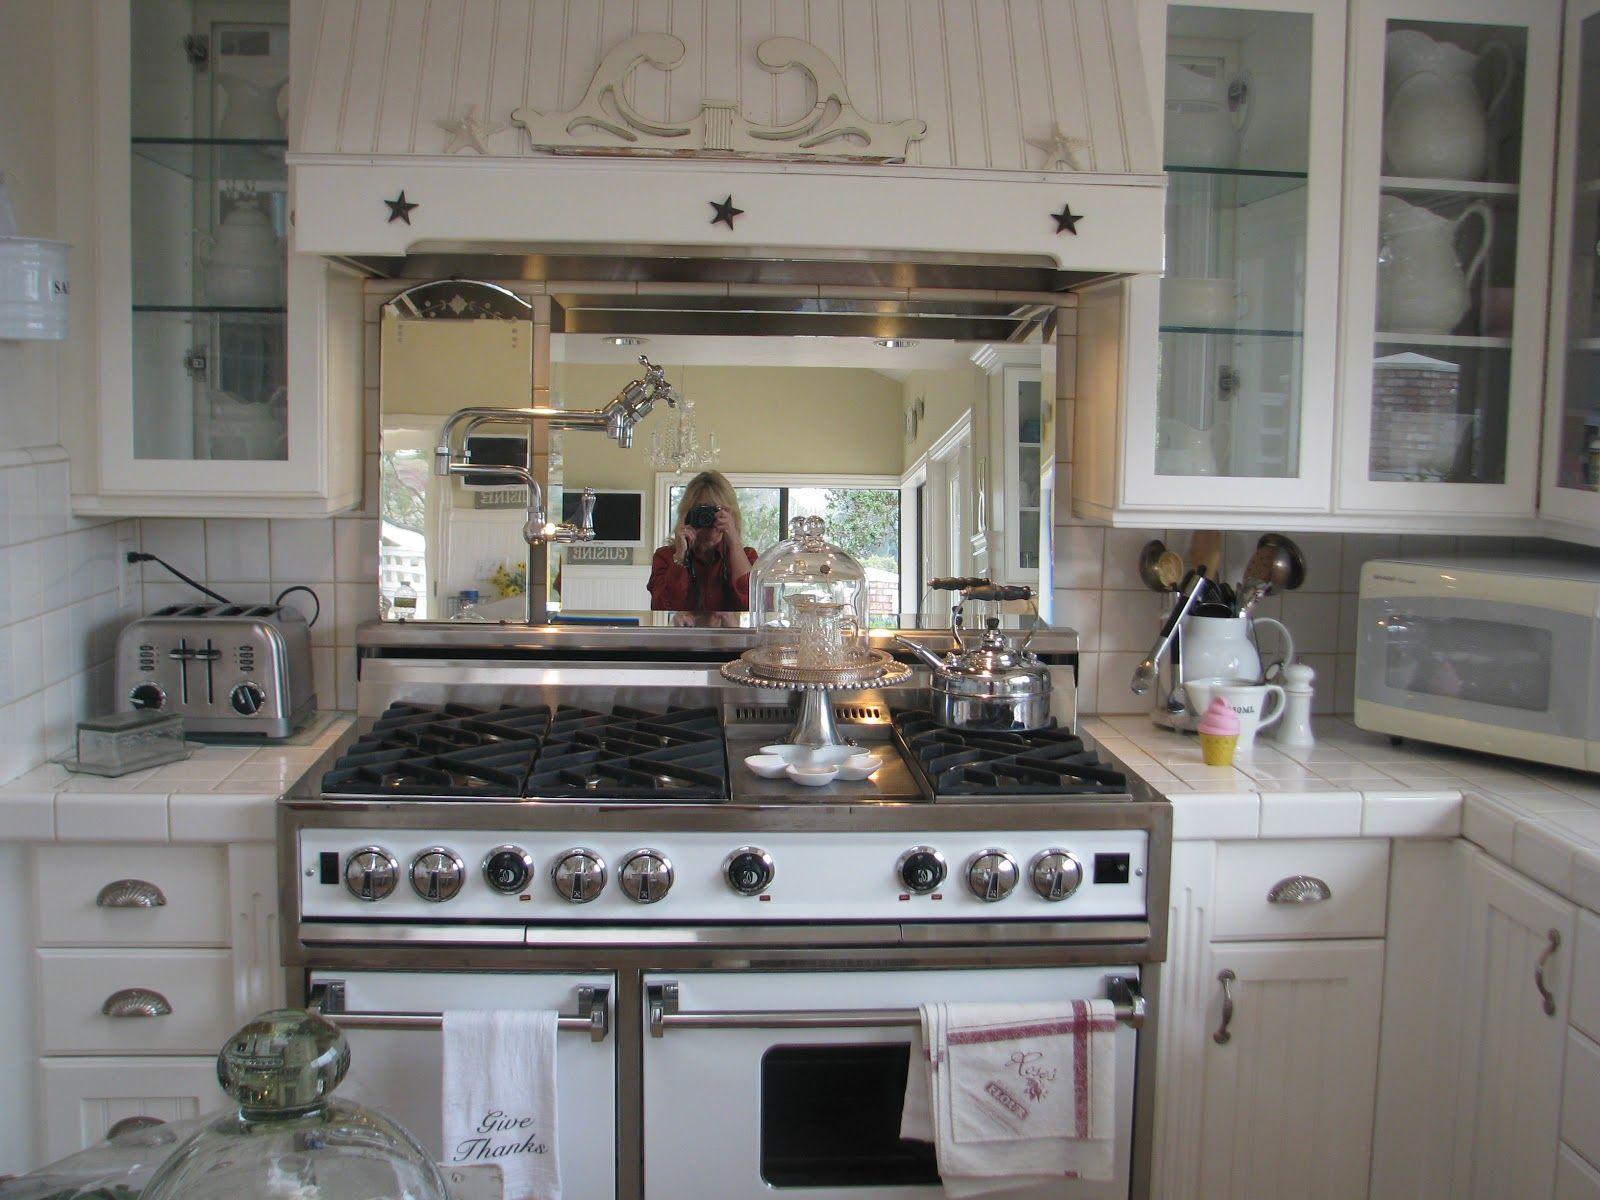 Cottage Kitchen With Vintage Stove So Grateful The Vintage